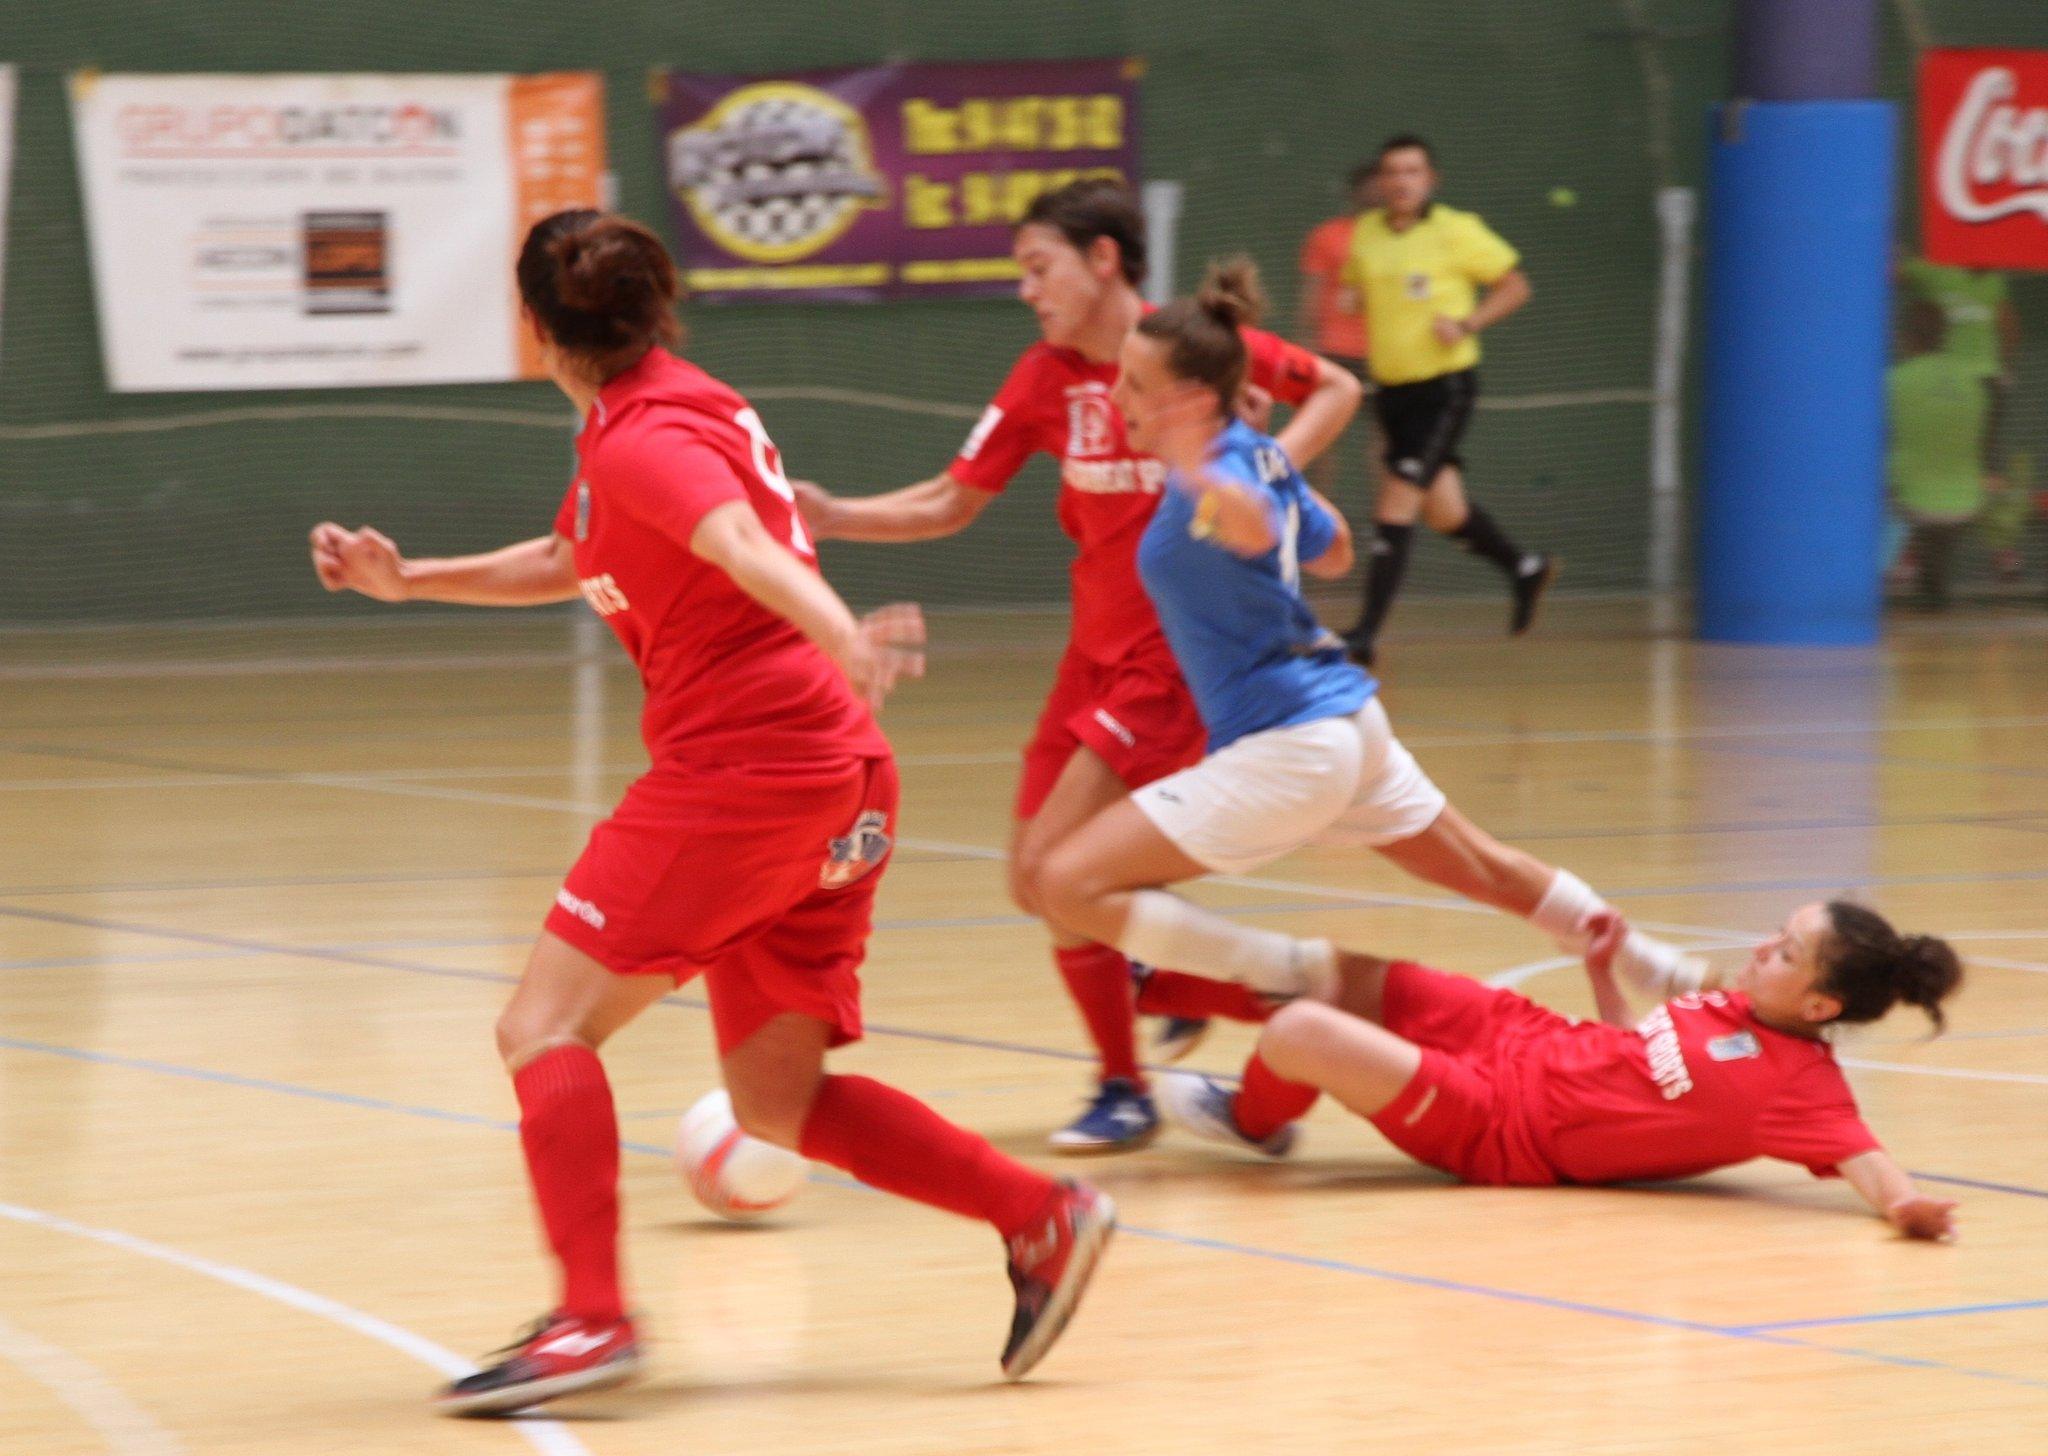 Crónica: Poio Pescamar FS - Bilbo CFS Femenino . Jornada 22ª. 1ª Div. de Fútbol Sala Femenino